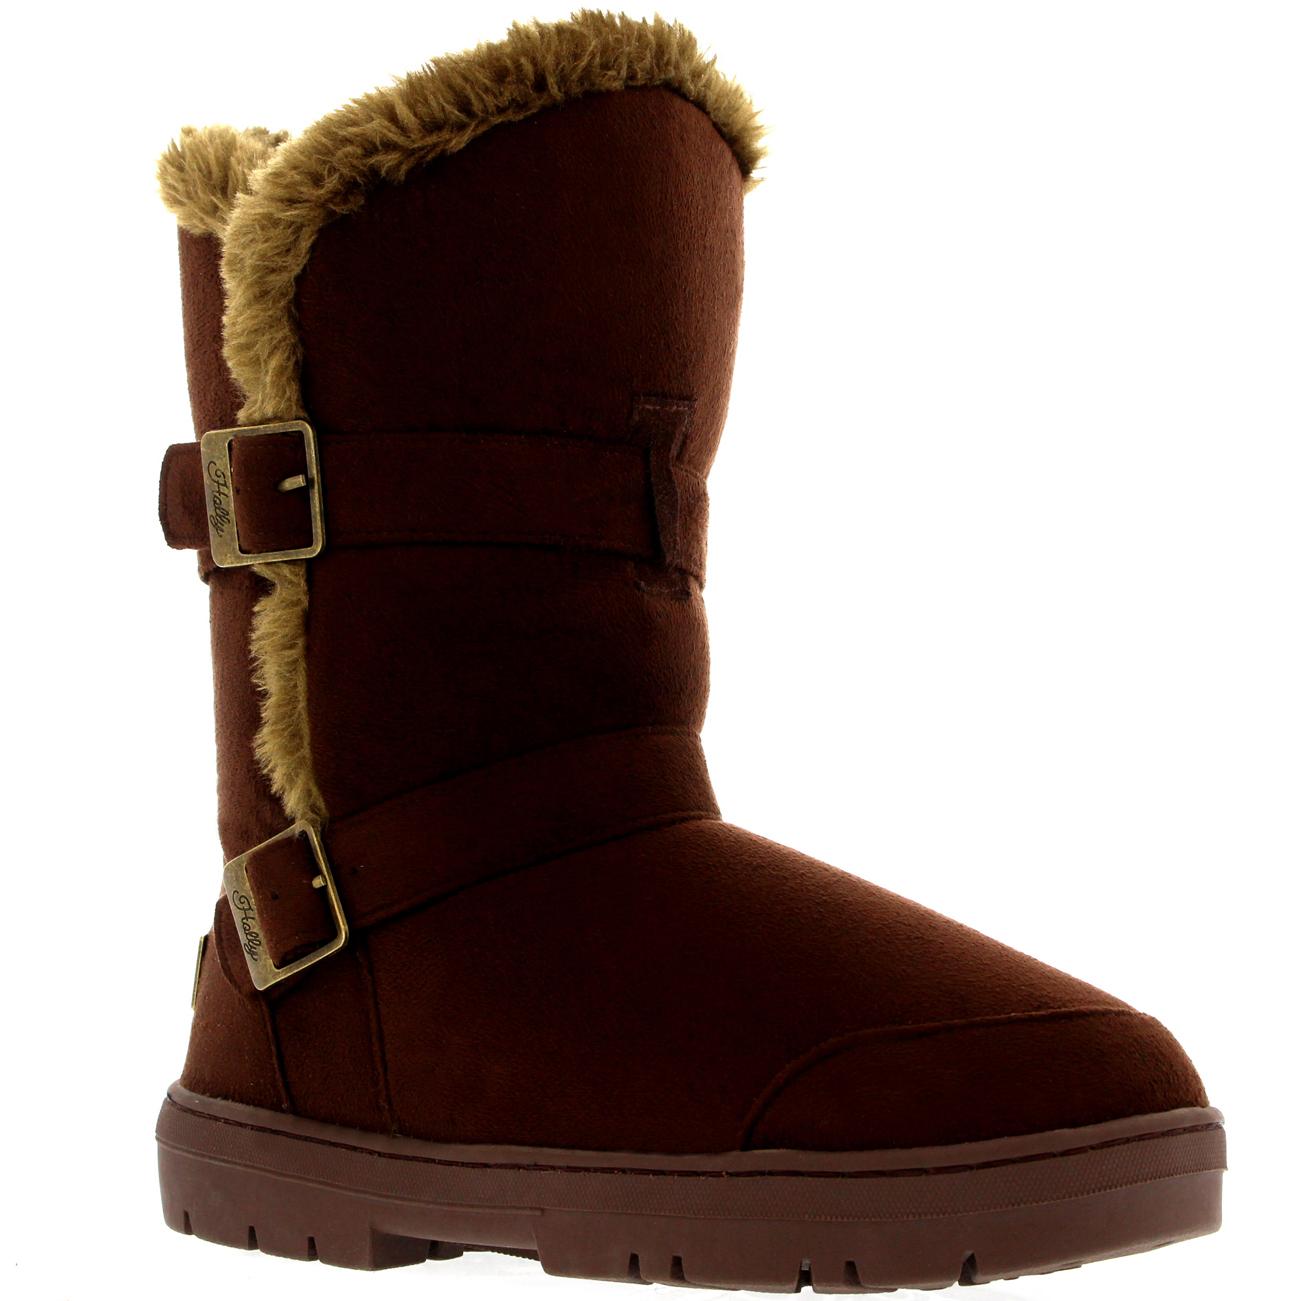 ugg boots 5803 sale nc rh vwsplitscreens com